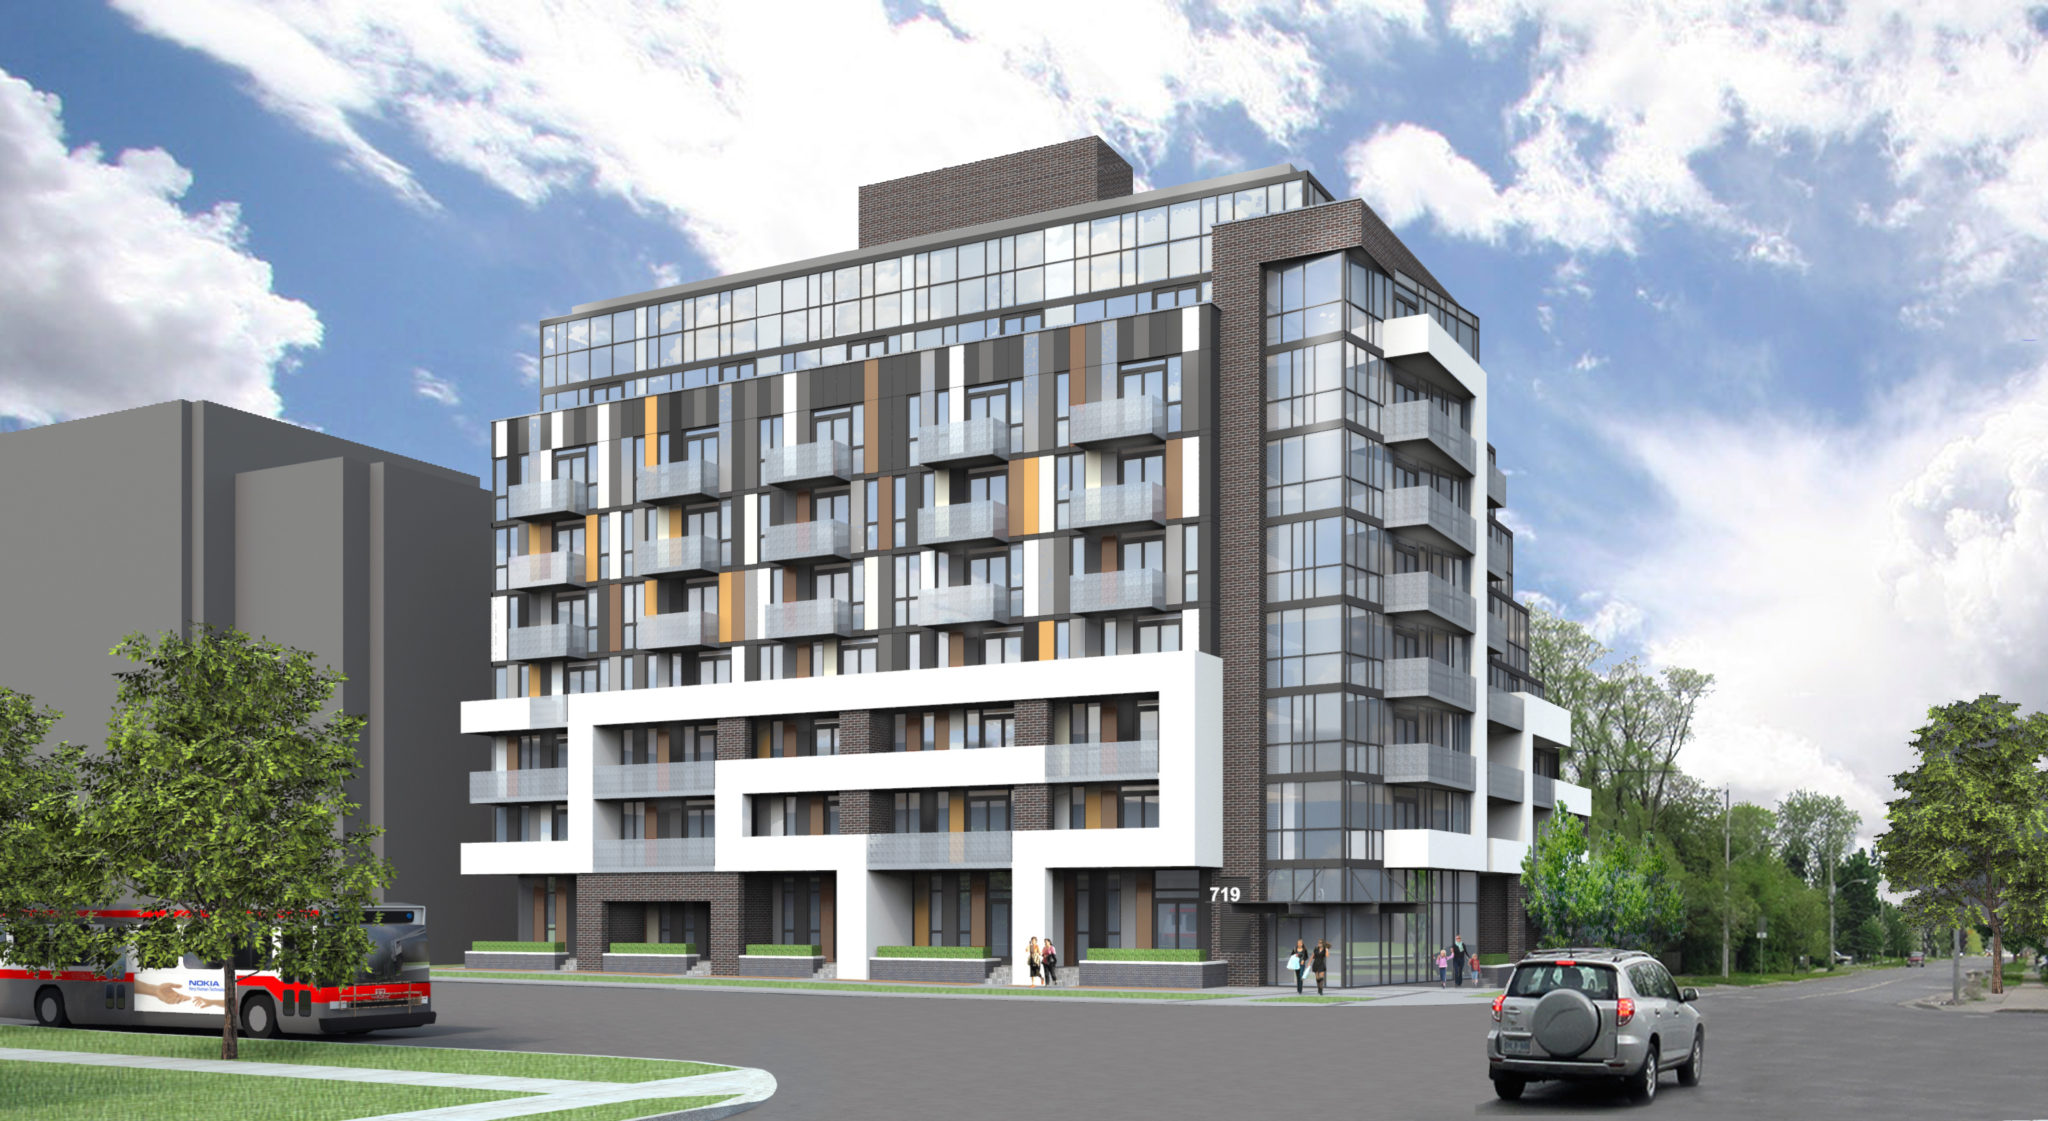 719 Sheppard Ave West - Multi Family Residential Development